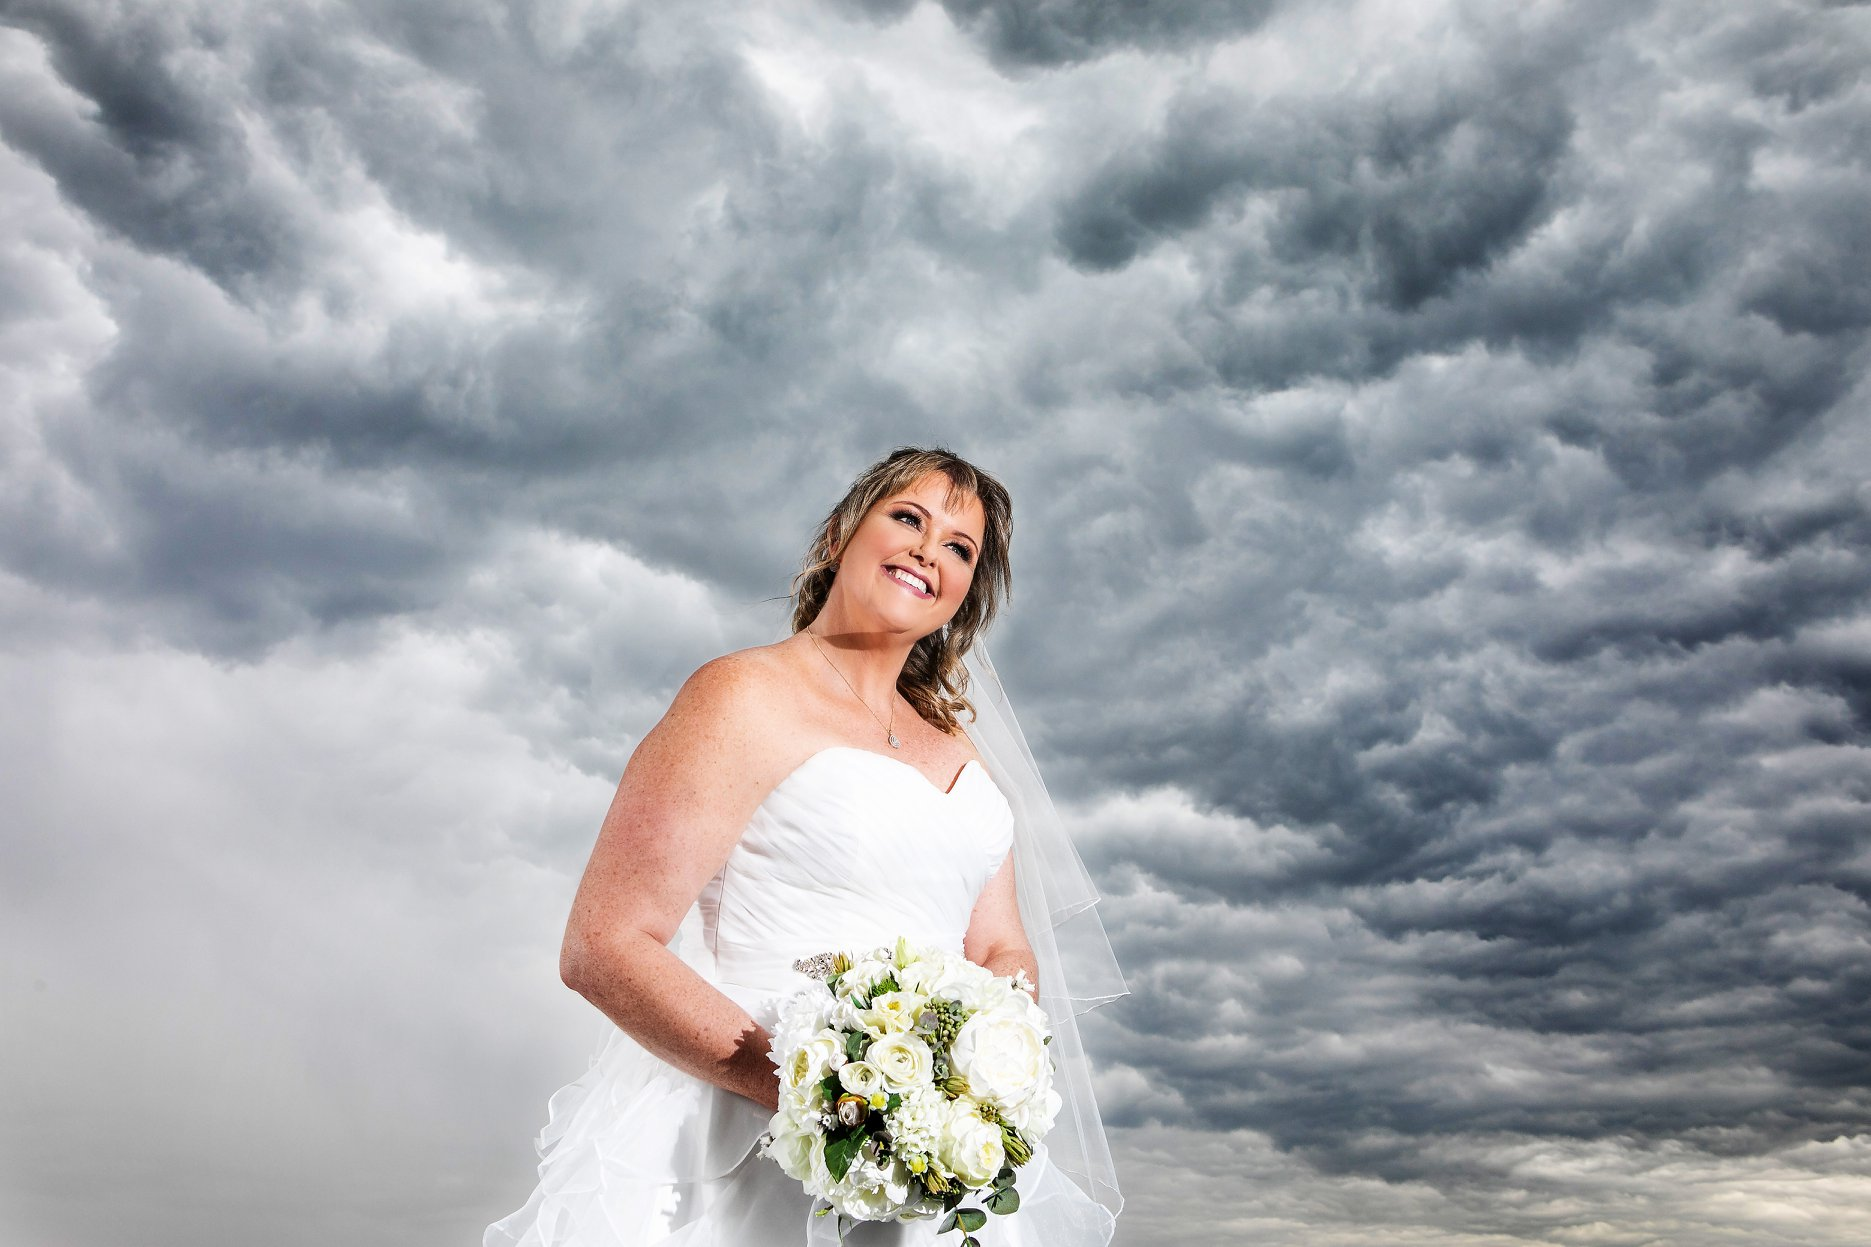 Bridal customisations